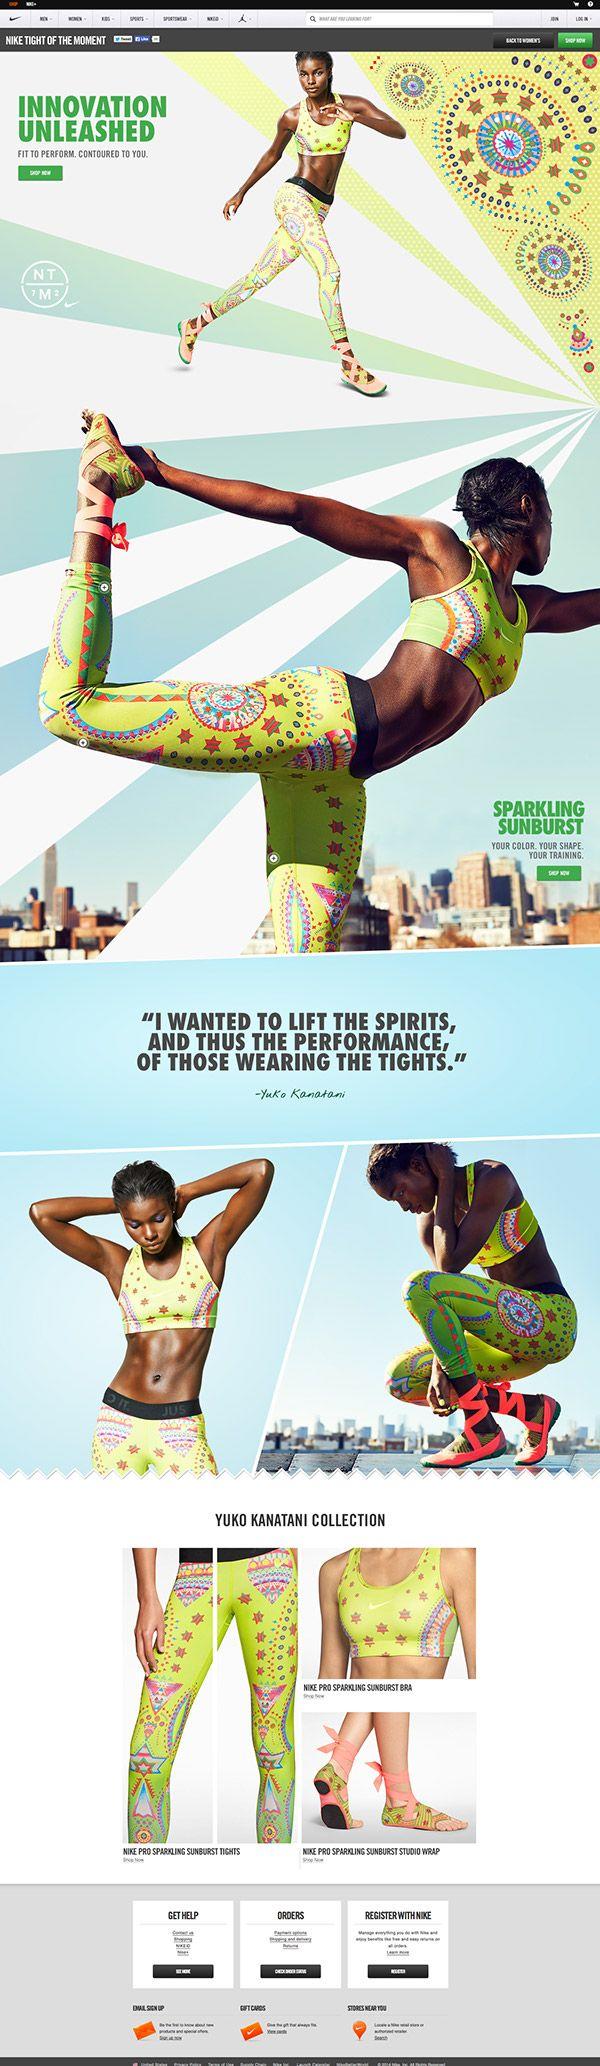 Nike: Tights of the Moment by Mariola Bruszewska, via Behance